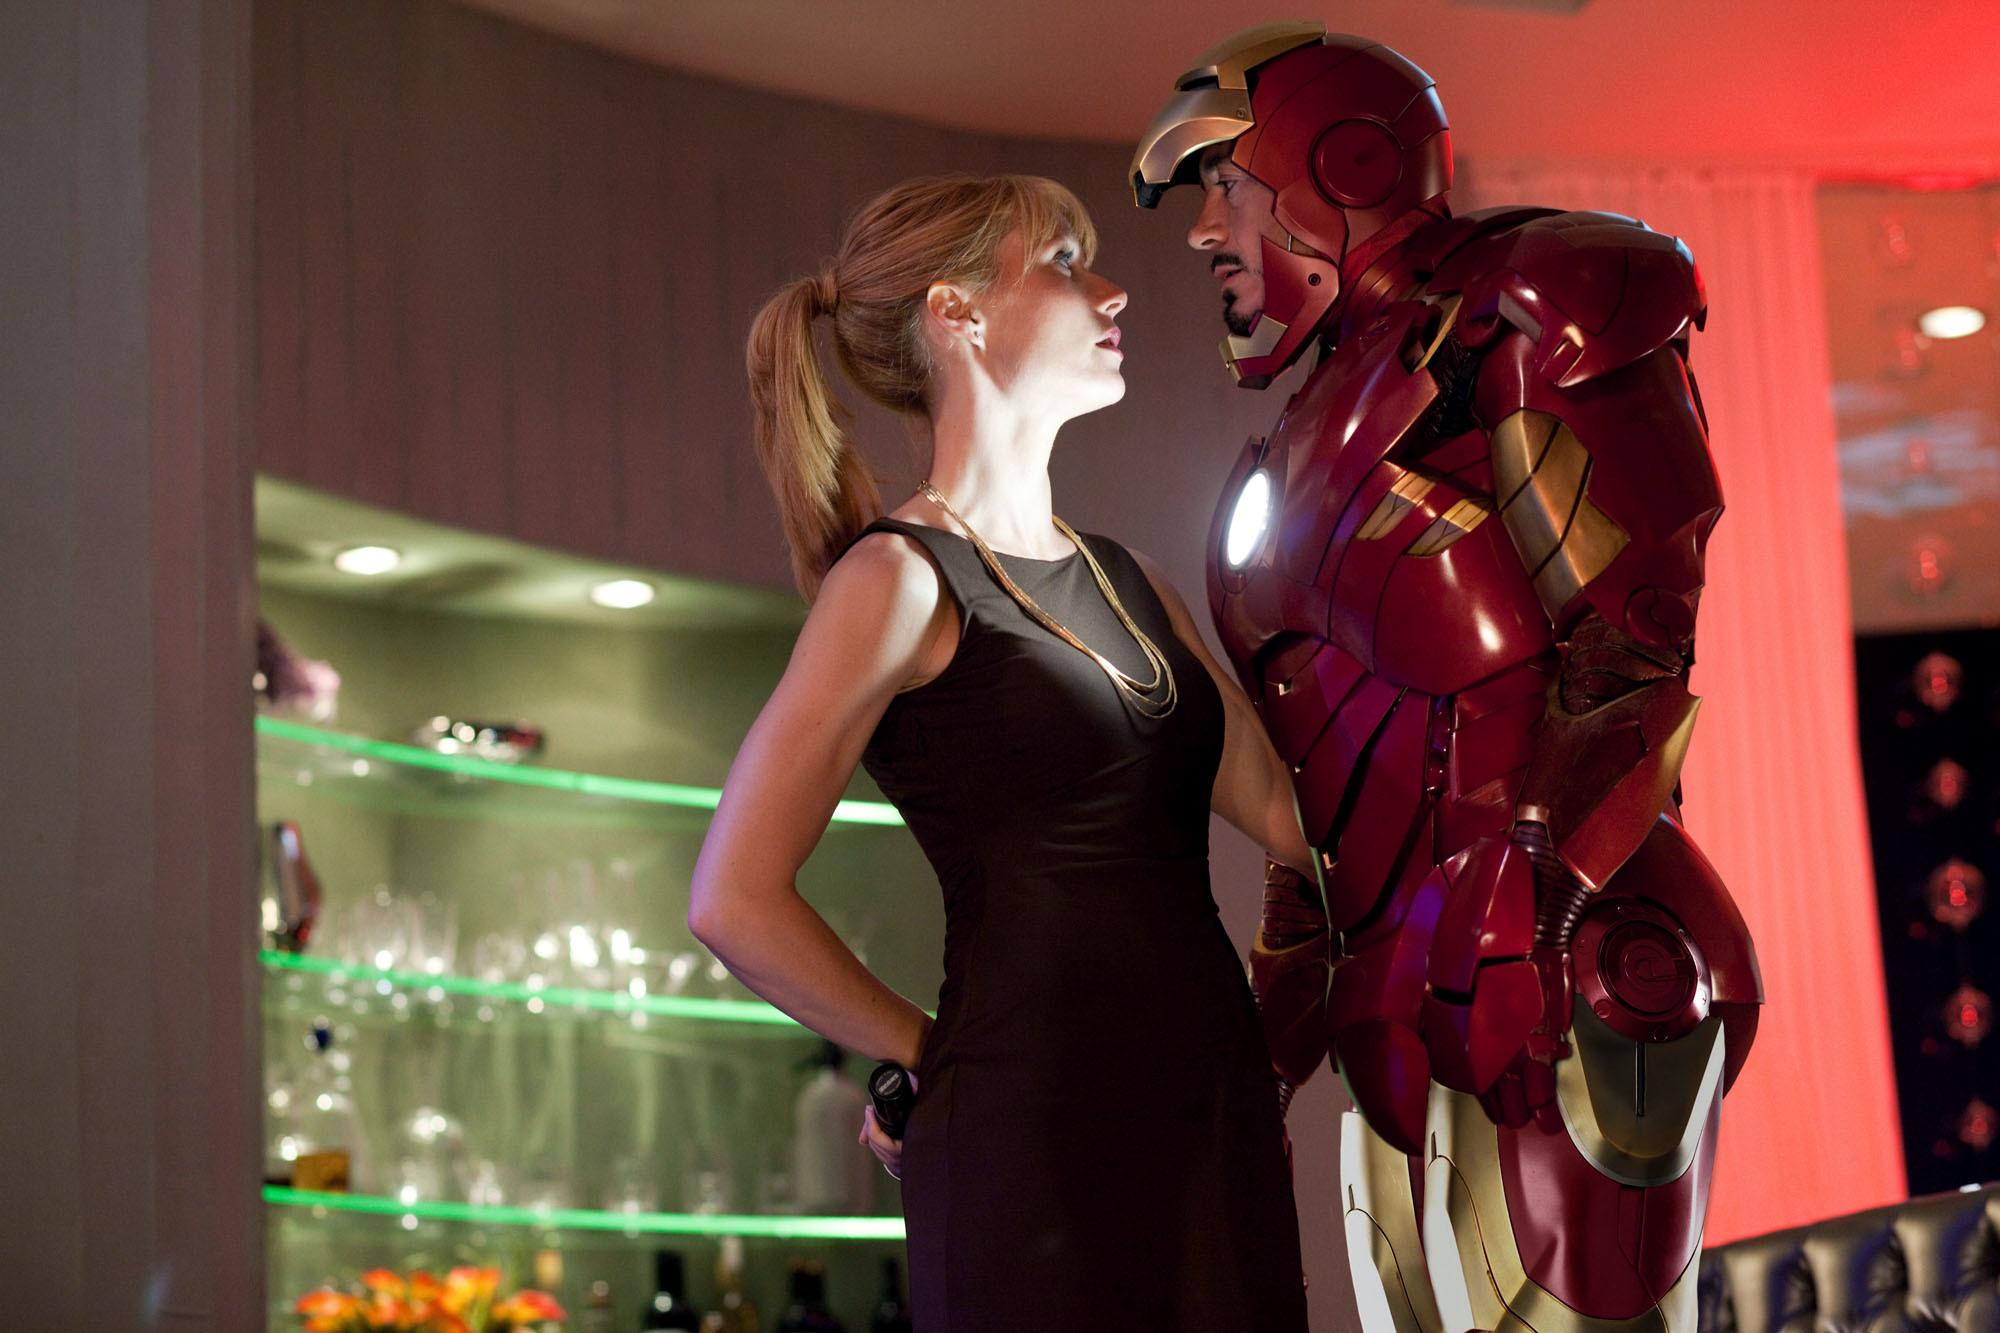 Robert Downey Jr. jokes Gwyneth Paltrow is his 'free pass'